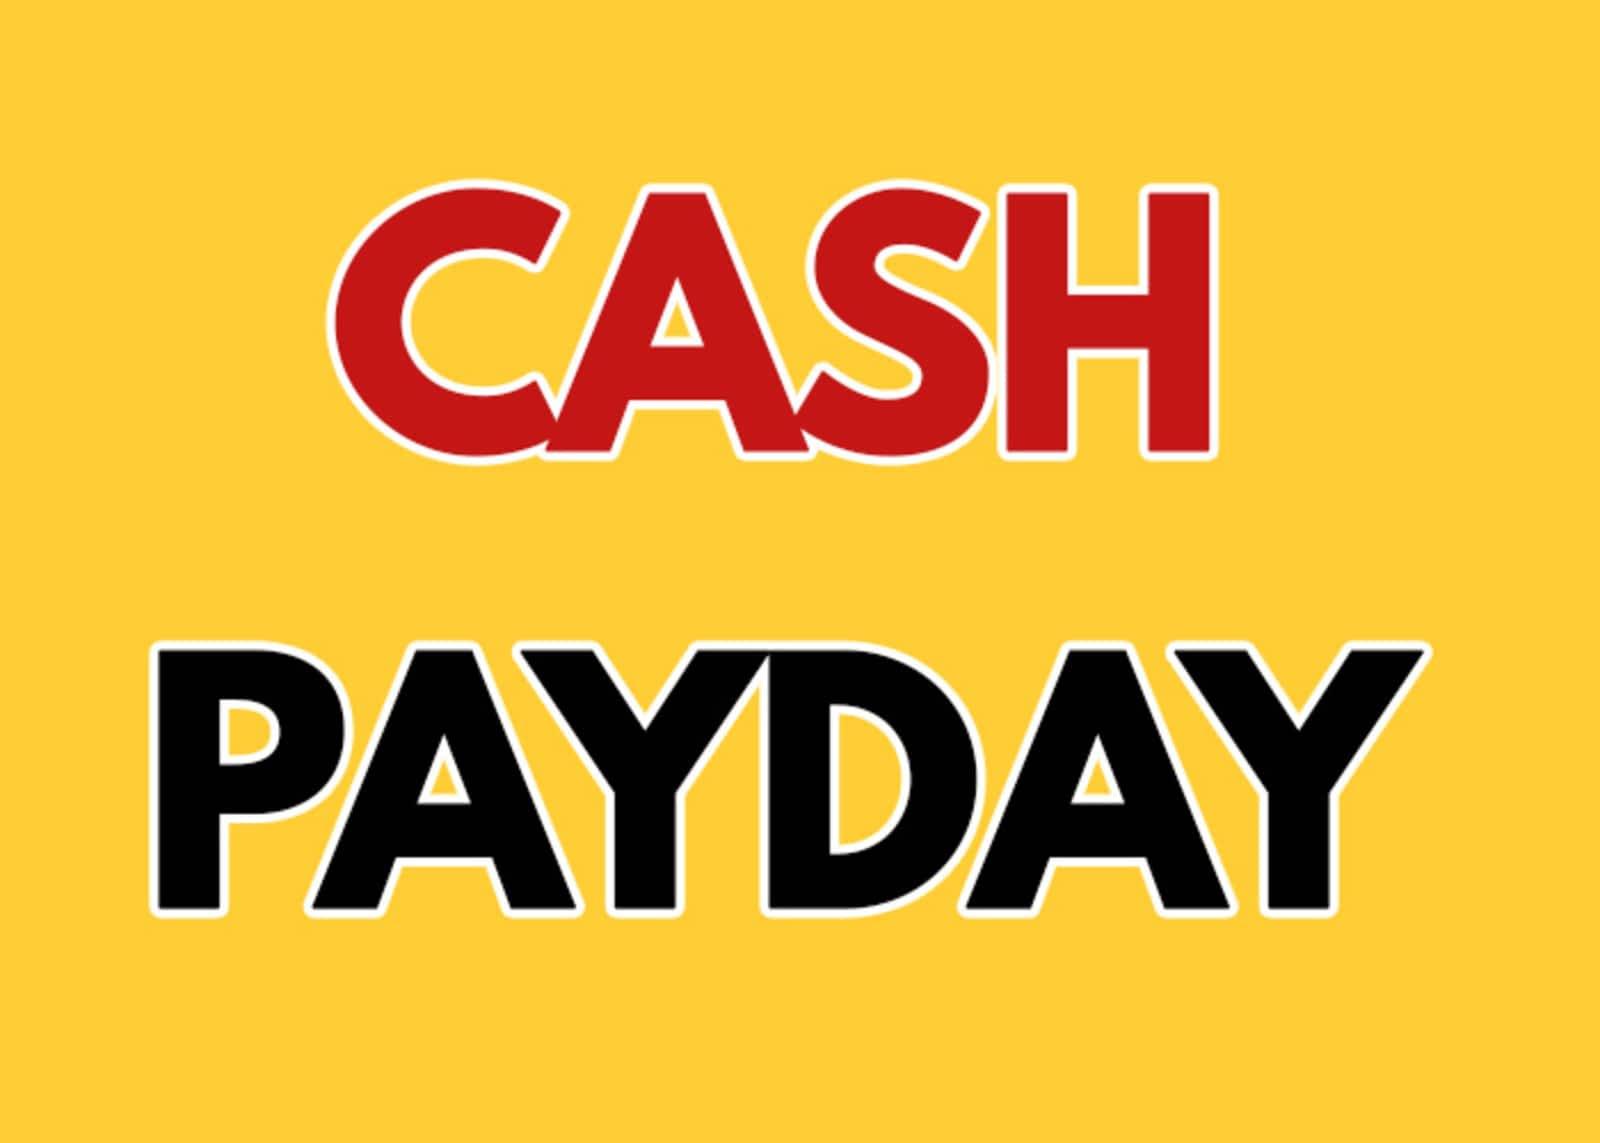 Cash credit loan in canara bank image 6